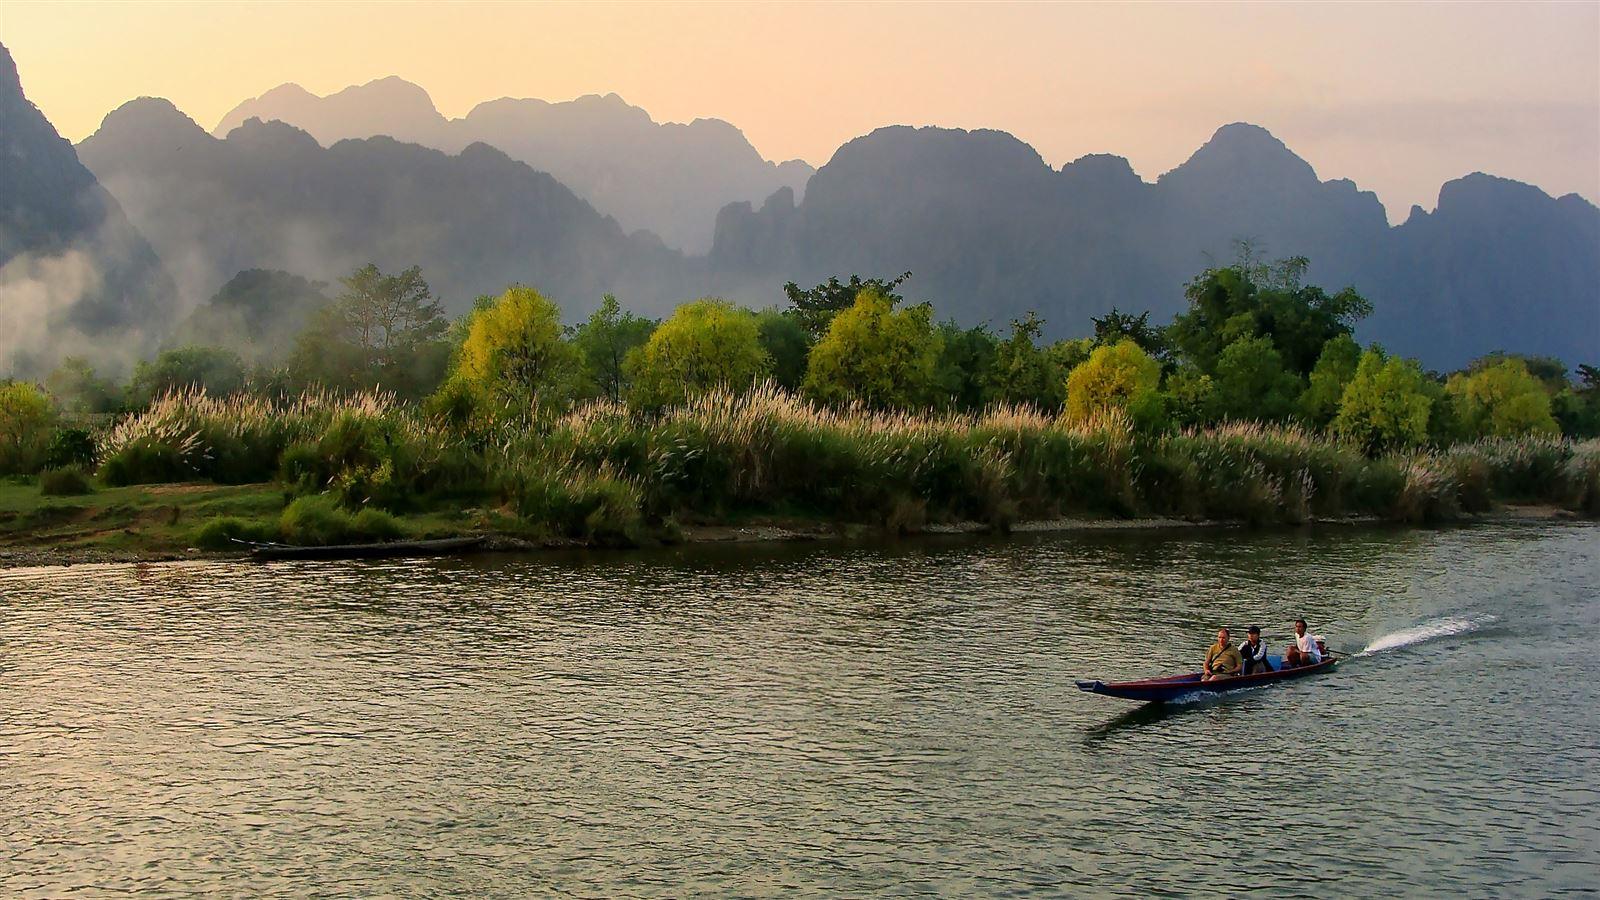 180503142931-04-destination-laos---vang-vieng